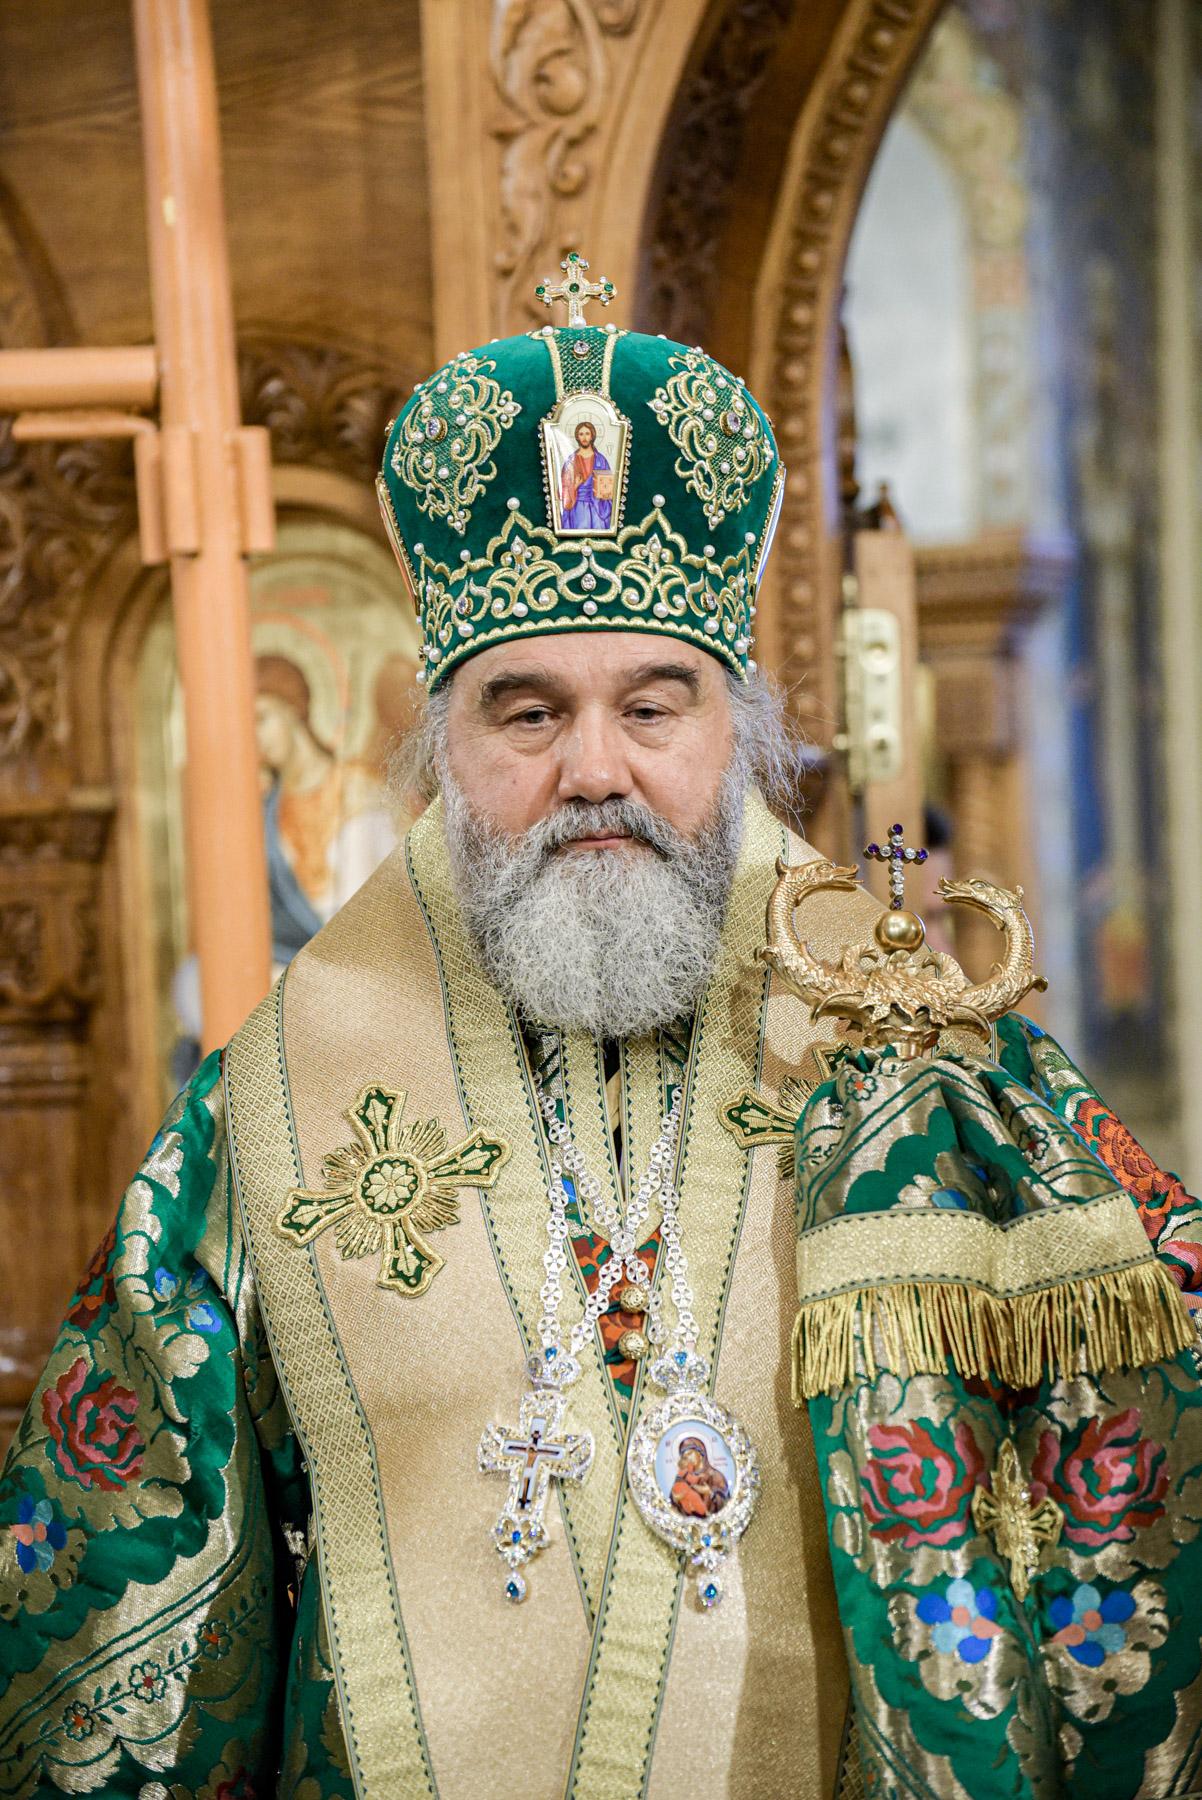 photos of orthodox christmas 0269 1